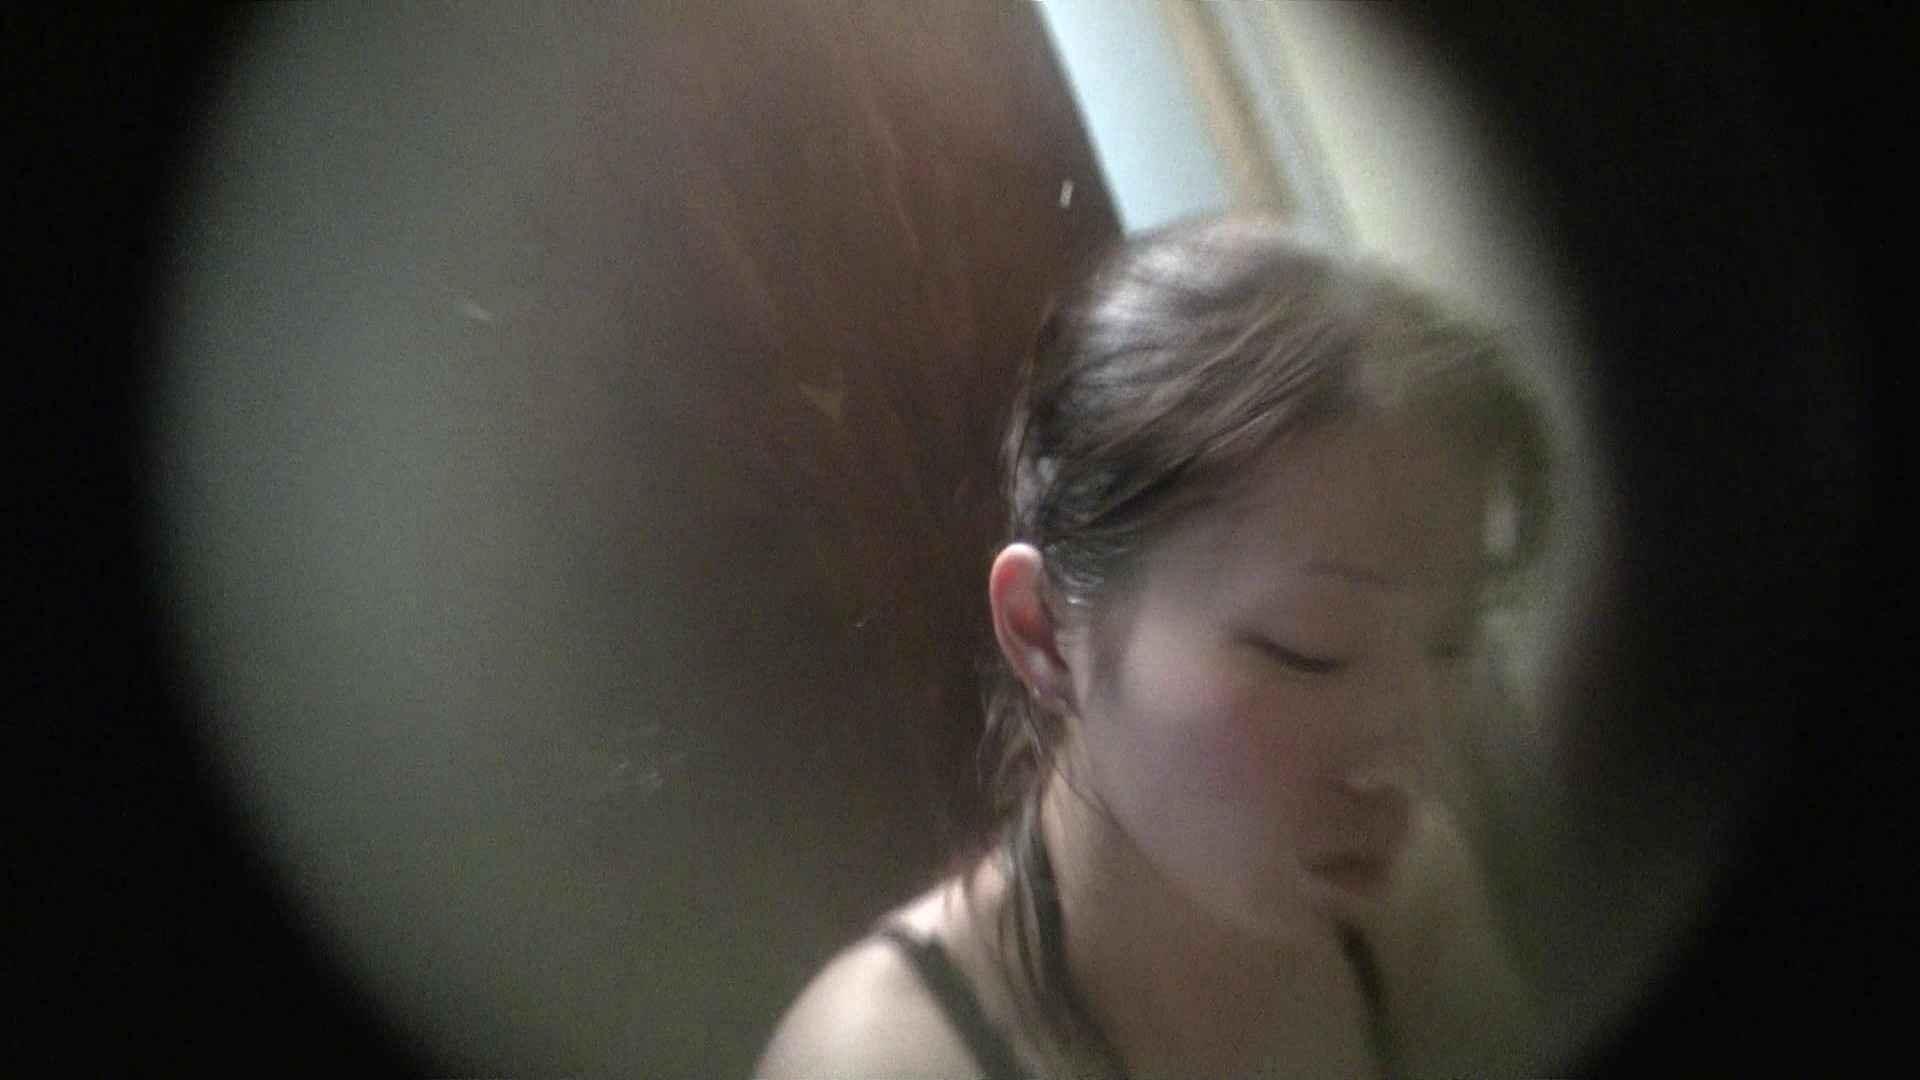 NO.01 胃下垂気味のへそピアスギャル 覗き  40Pix 38